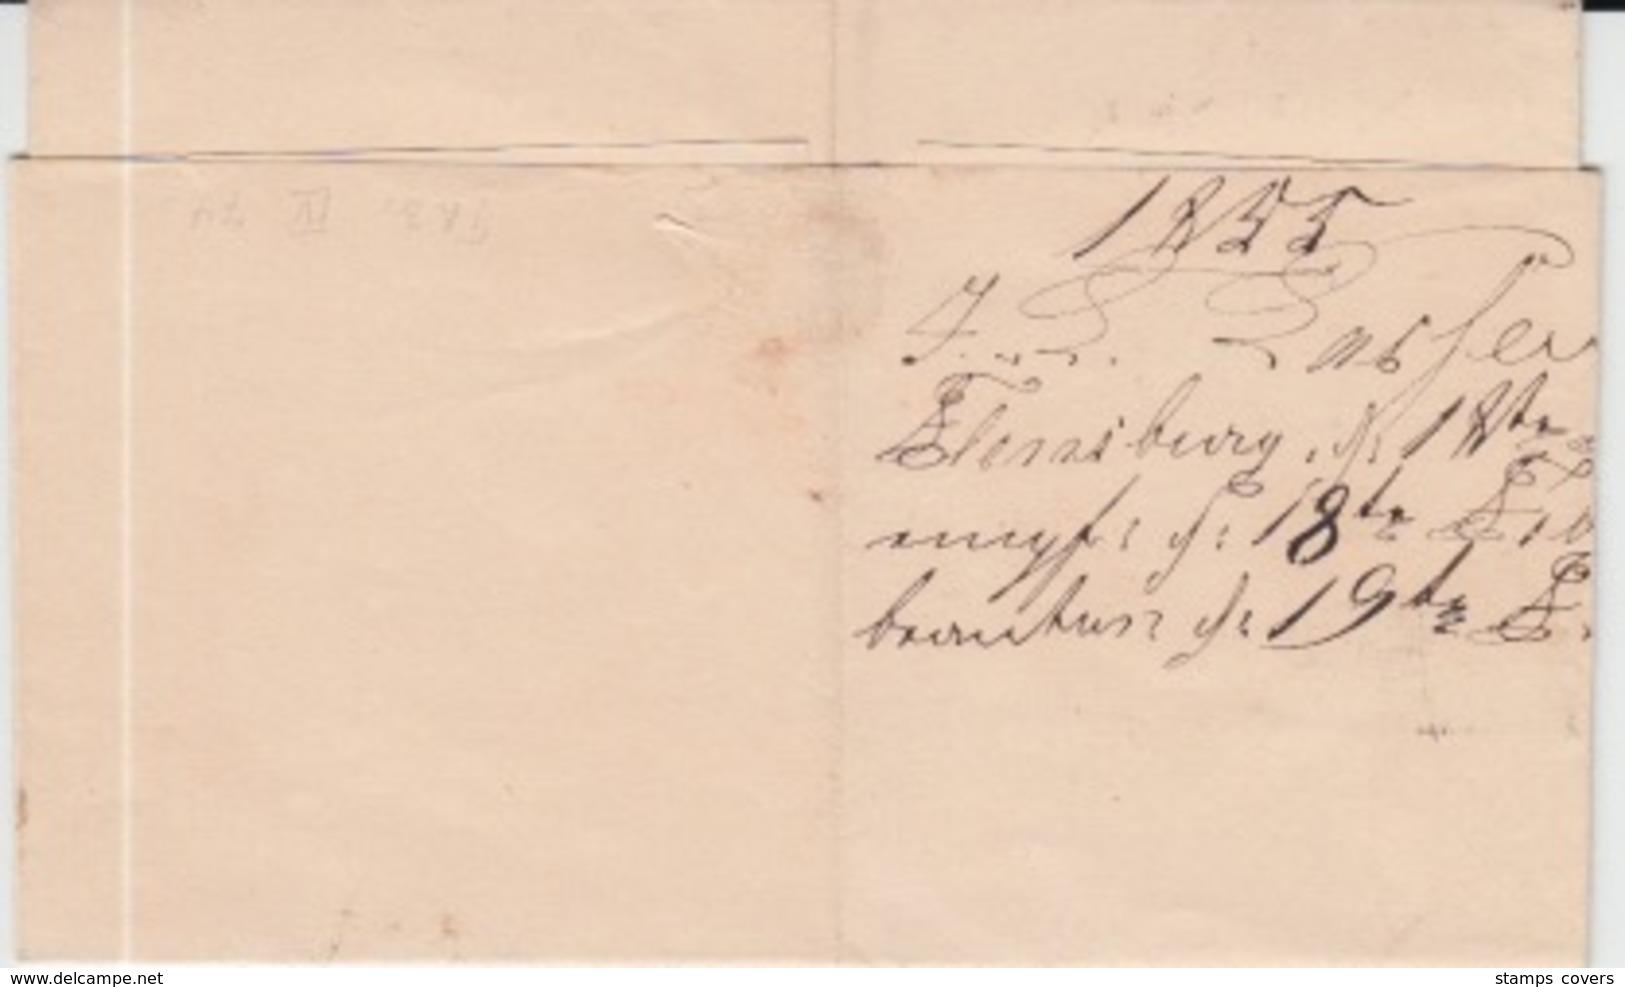 DENMARK MICHEL 1 USED COVER 18/02/1855 FLENSBORG (FLENSBOURG) TO SLESVIG (SCHLESWIG)) - 1851-63 (Frederik VII)